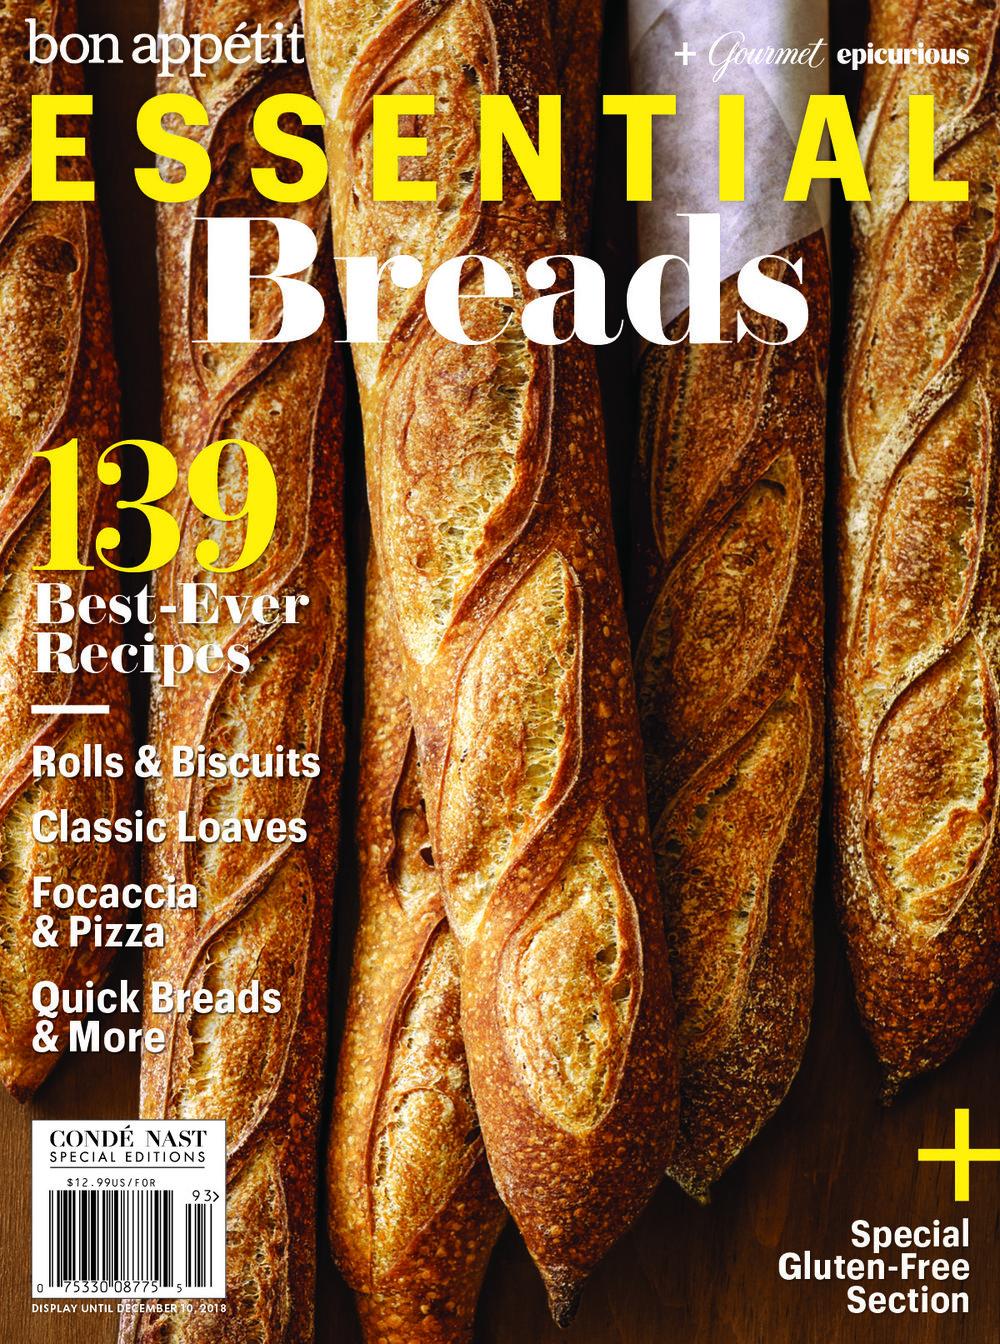 Essential-Bread_Cover.jpg